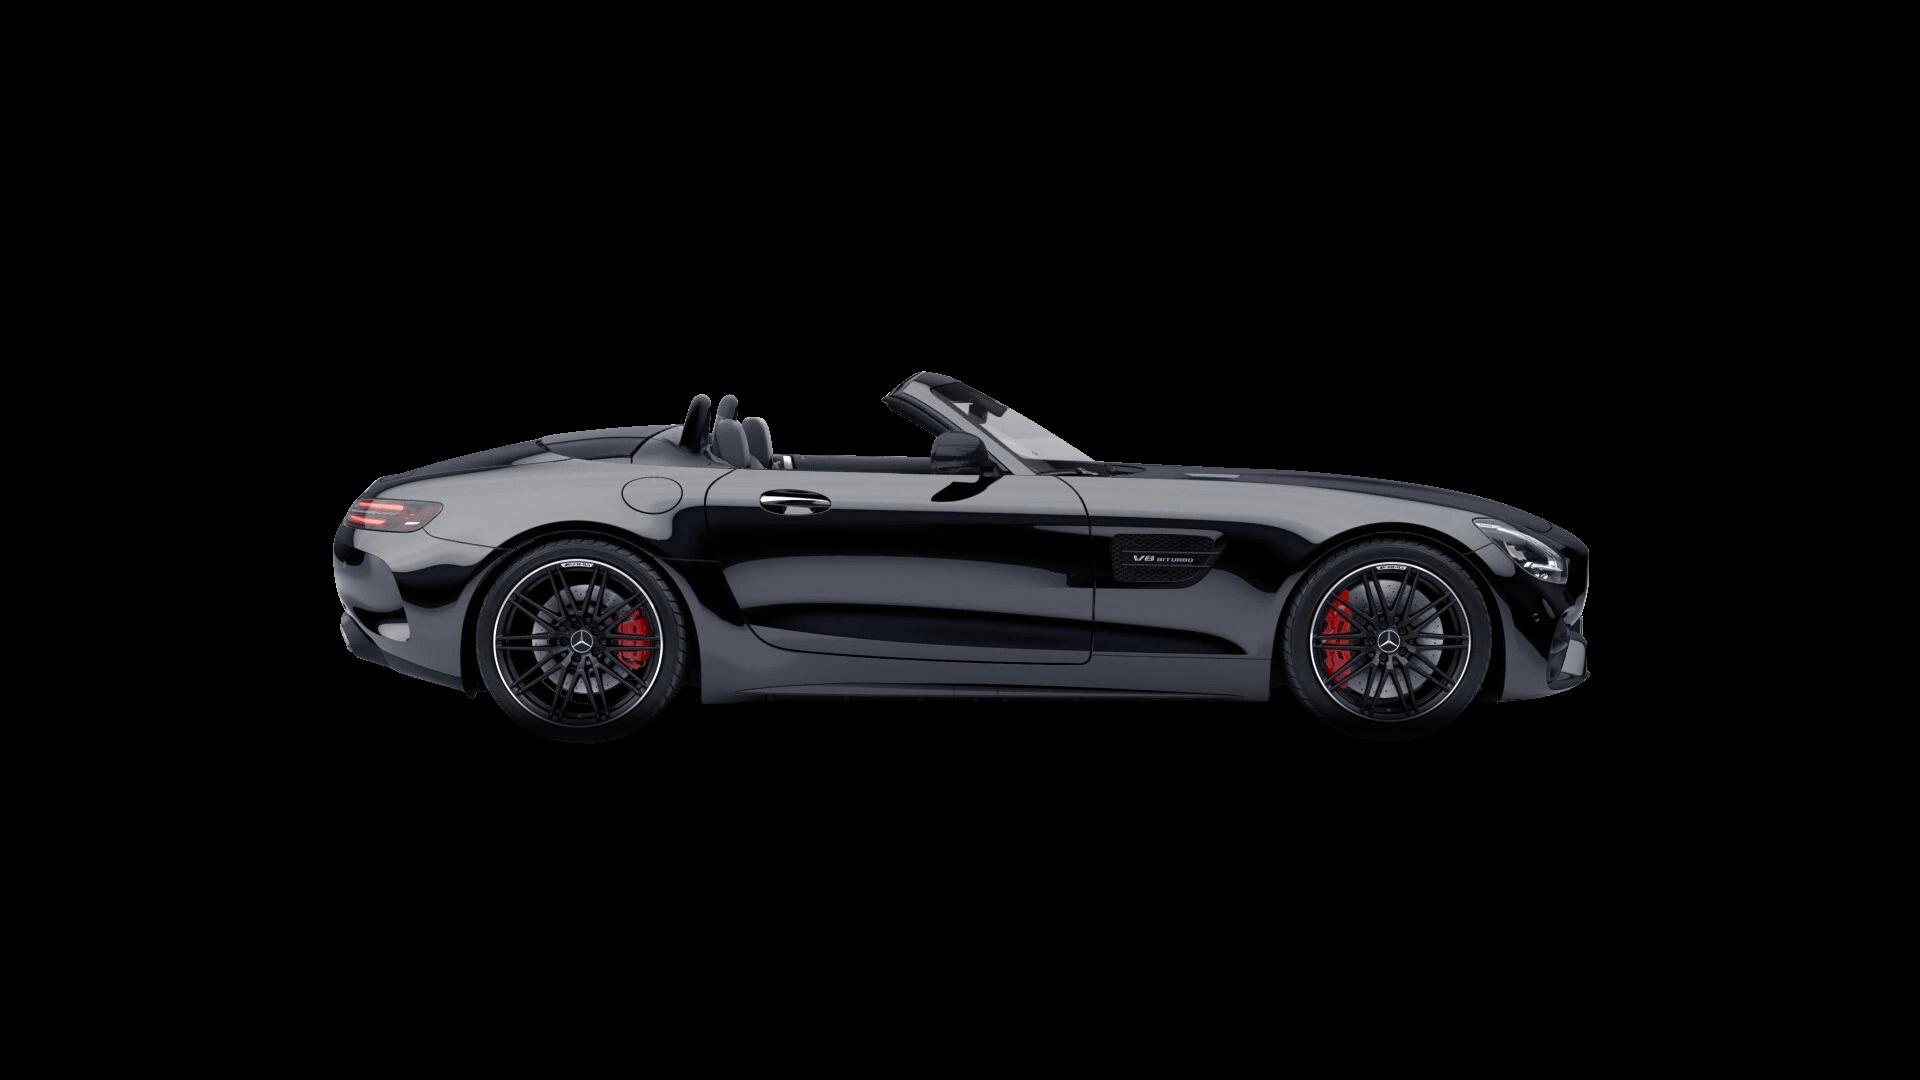 https://bluesky-cogcms.cdn.imgeng.in/media/35453/mercedes-amg-gt-c-roadster.png